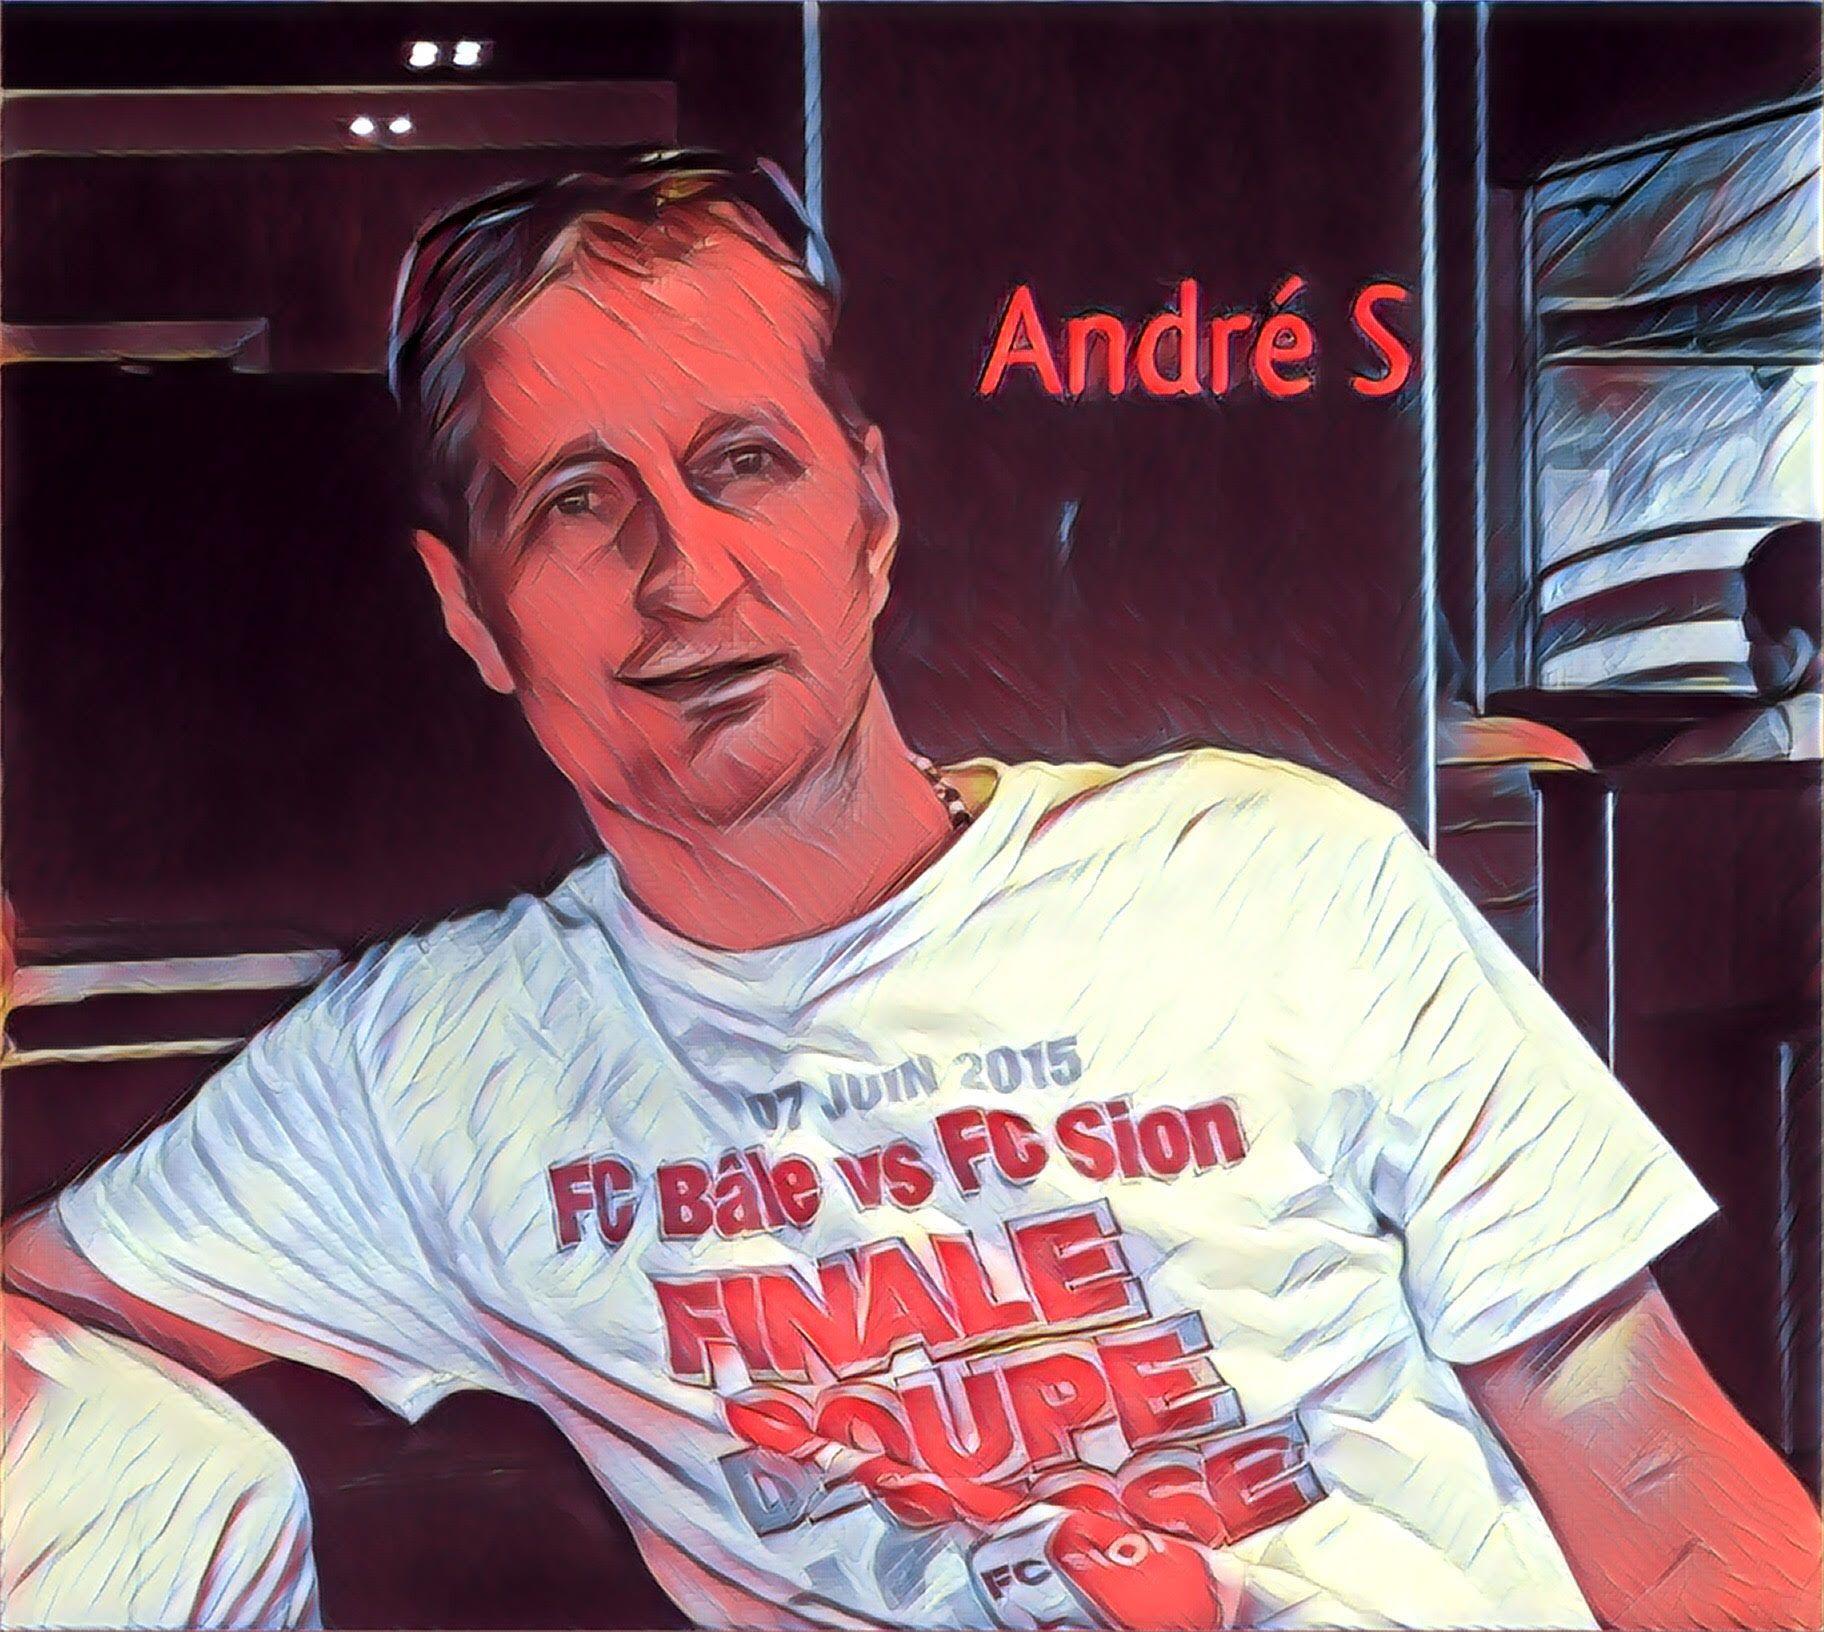 André Schöpf